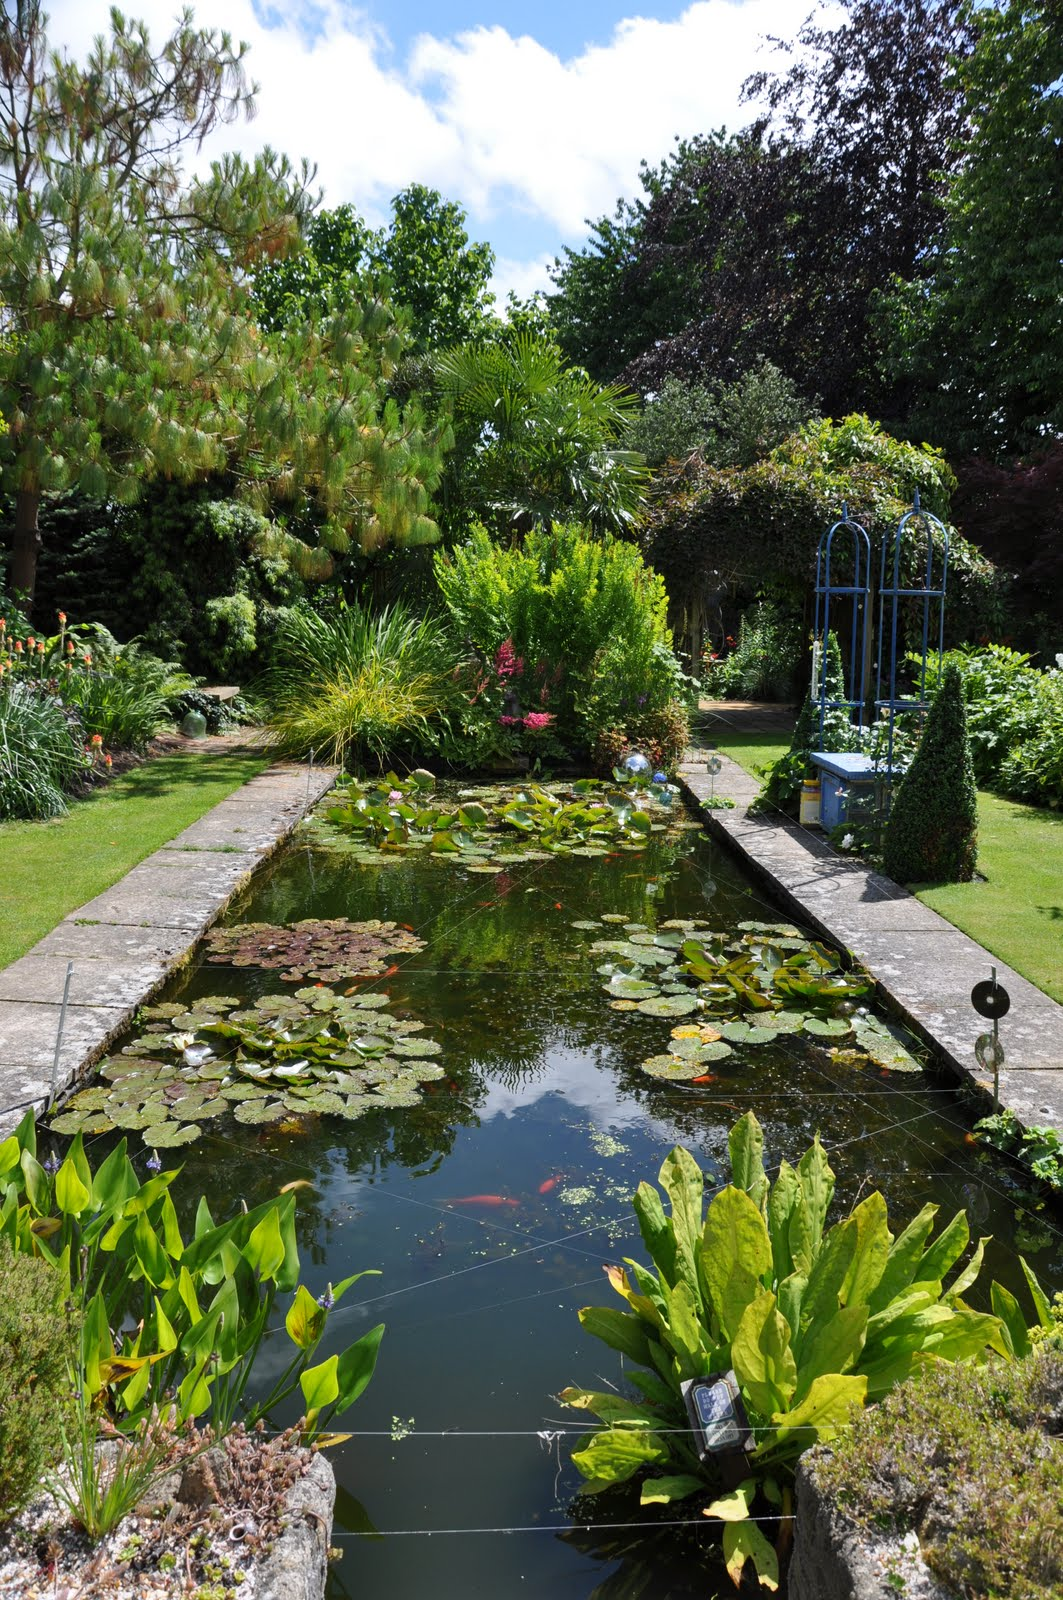 100+ Cool DIY Backyard Pond Design Ideas For Your Garden on Pond Ideas Backyard id=89891